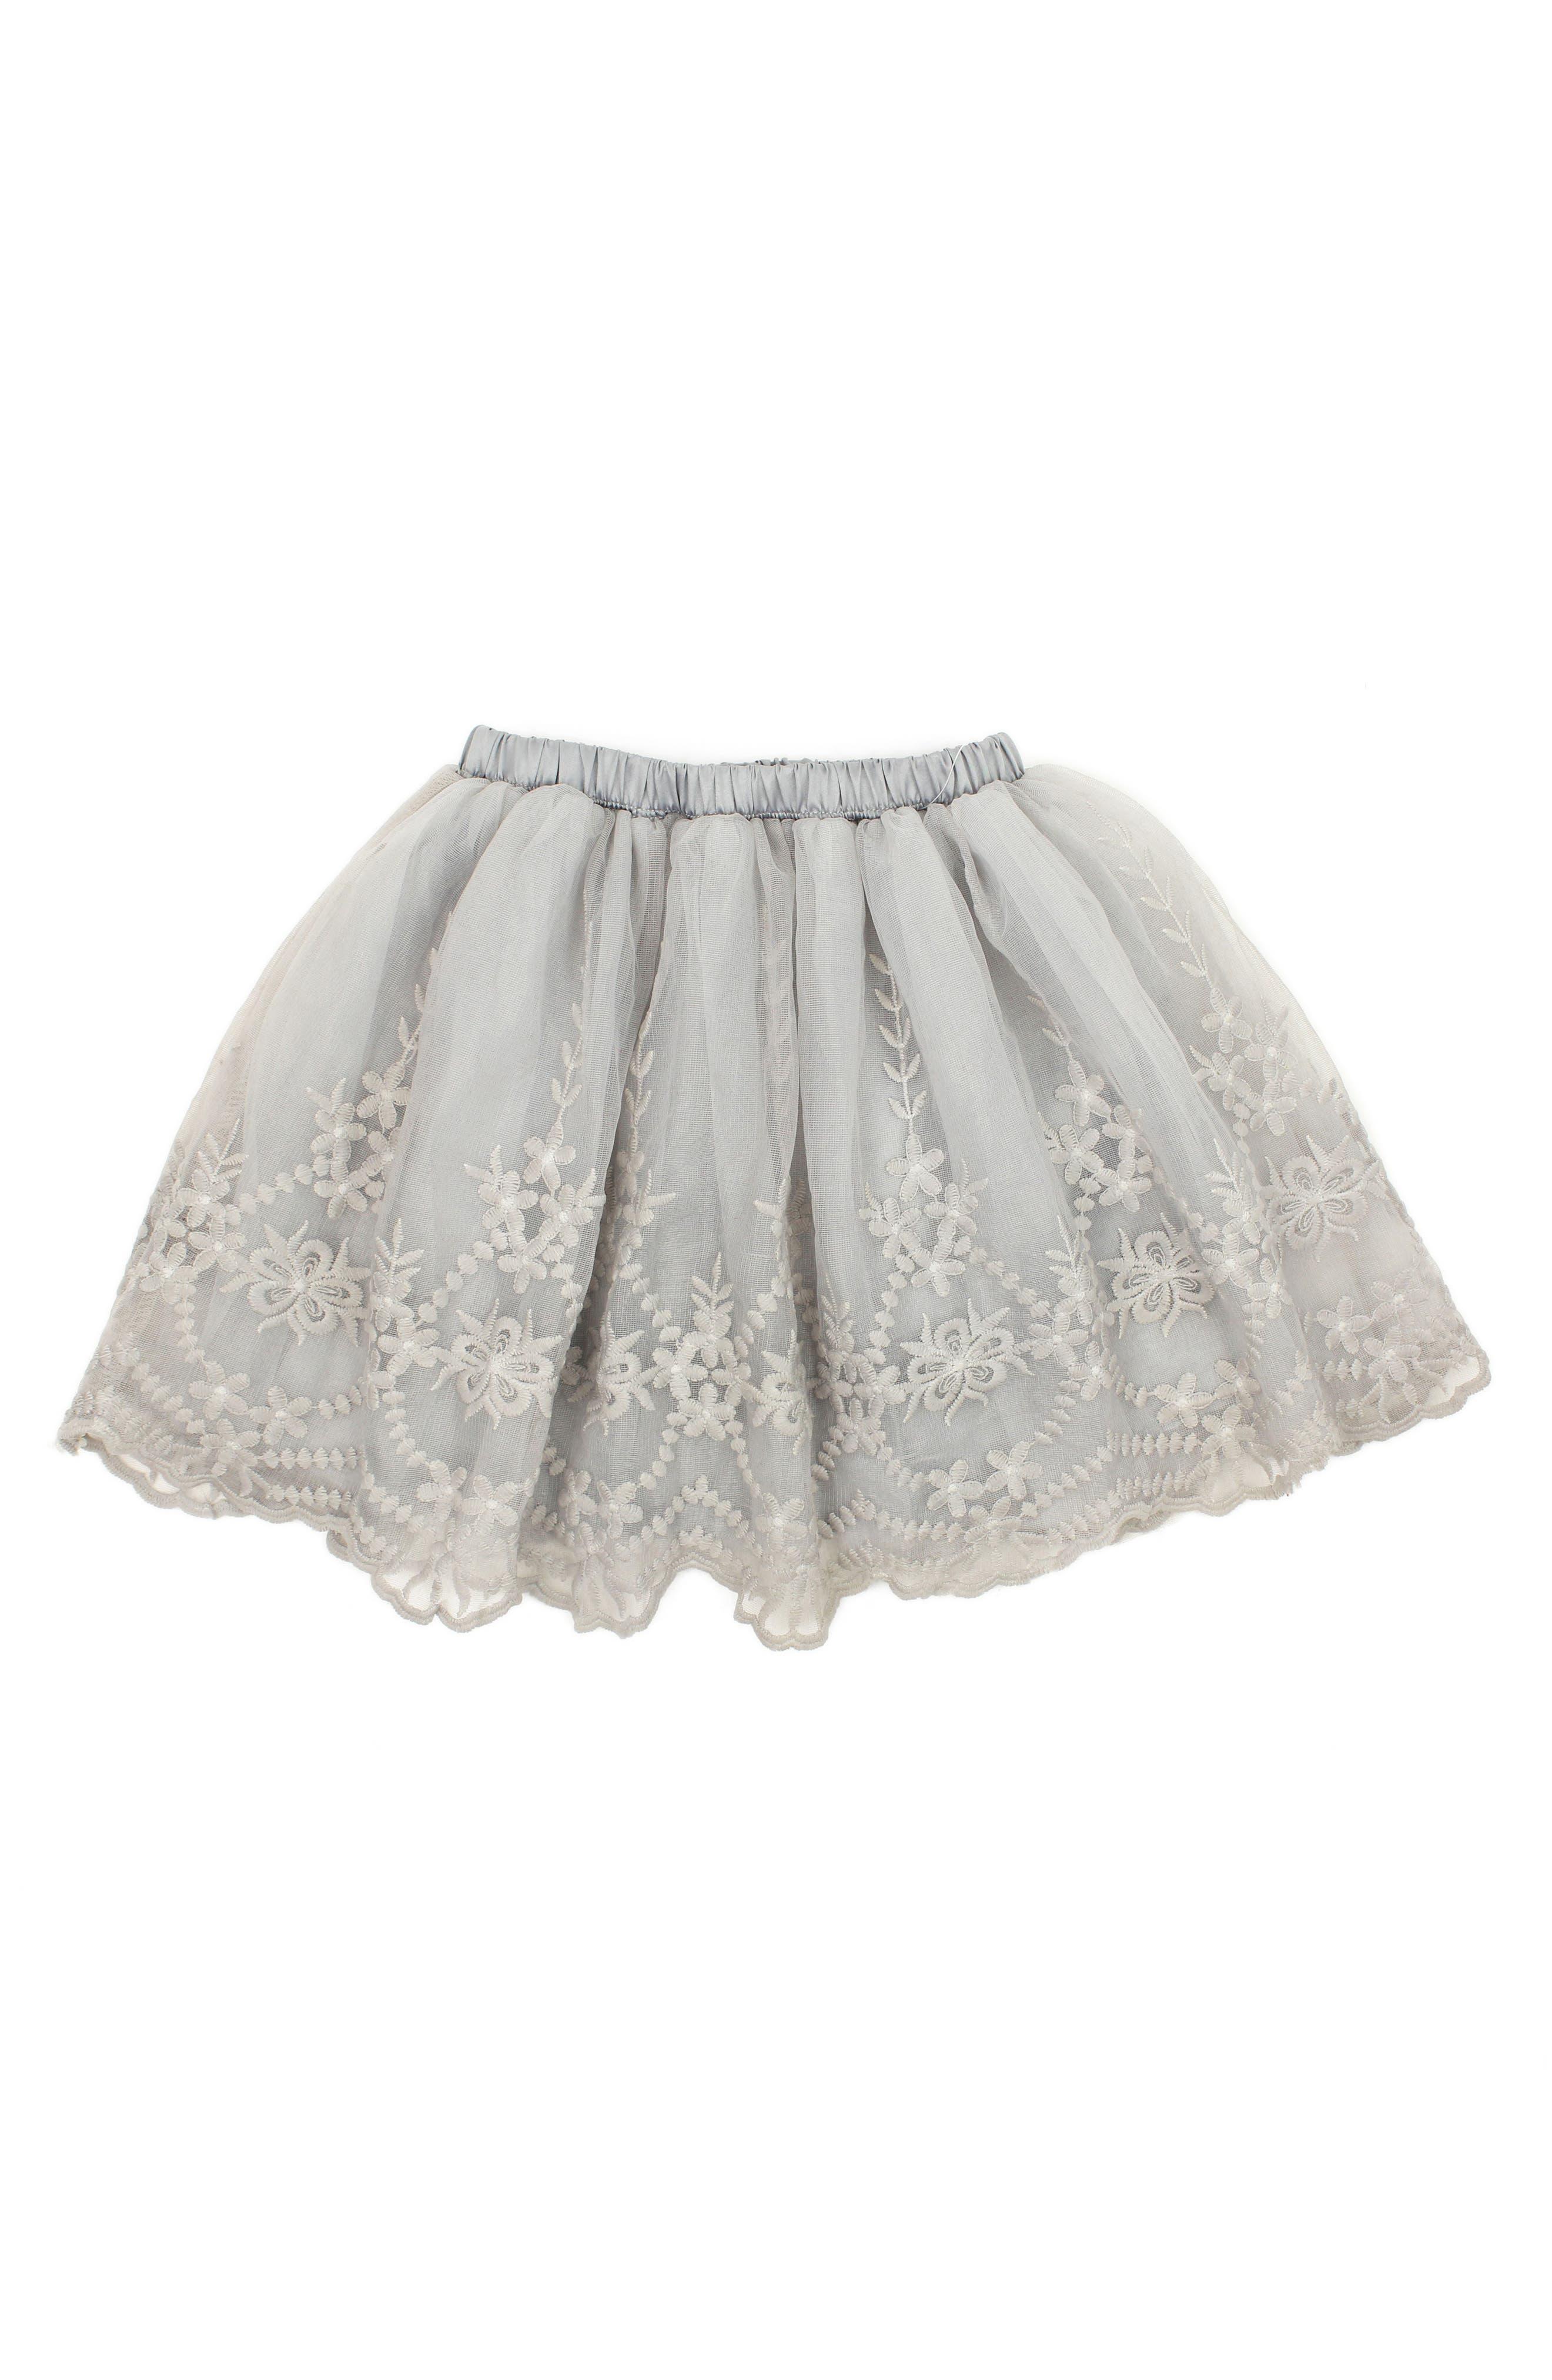 Main Image - Popatu Embroidered Tulle Skirt (Toddler Girls & Little Girls)